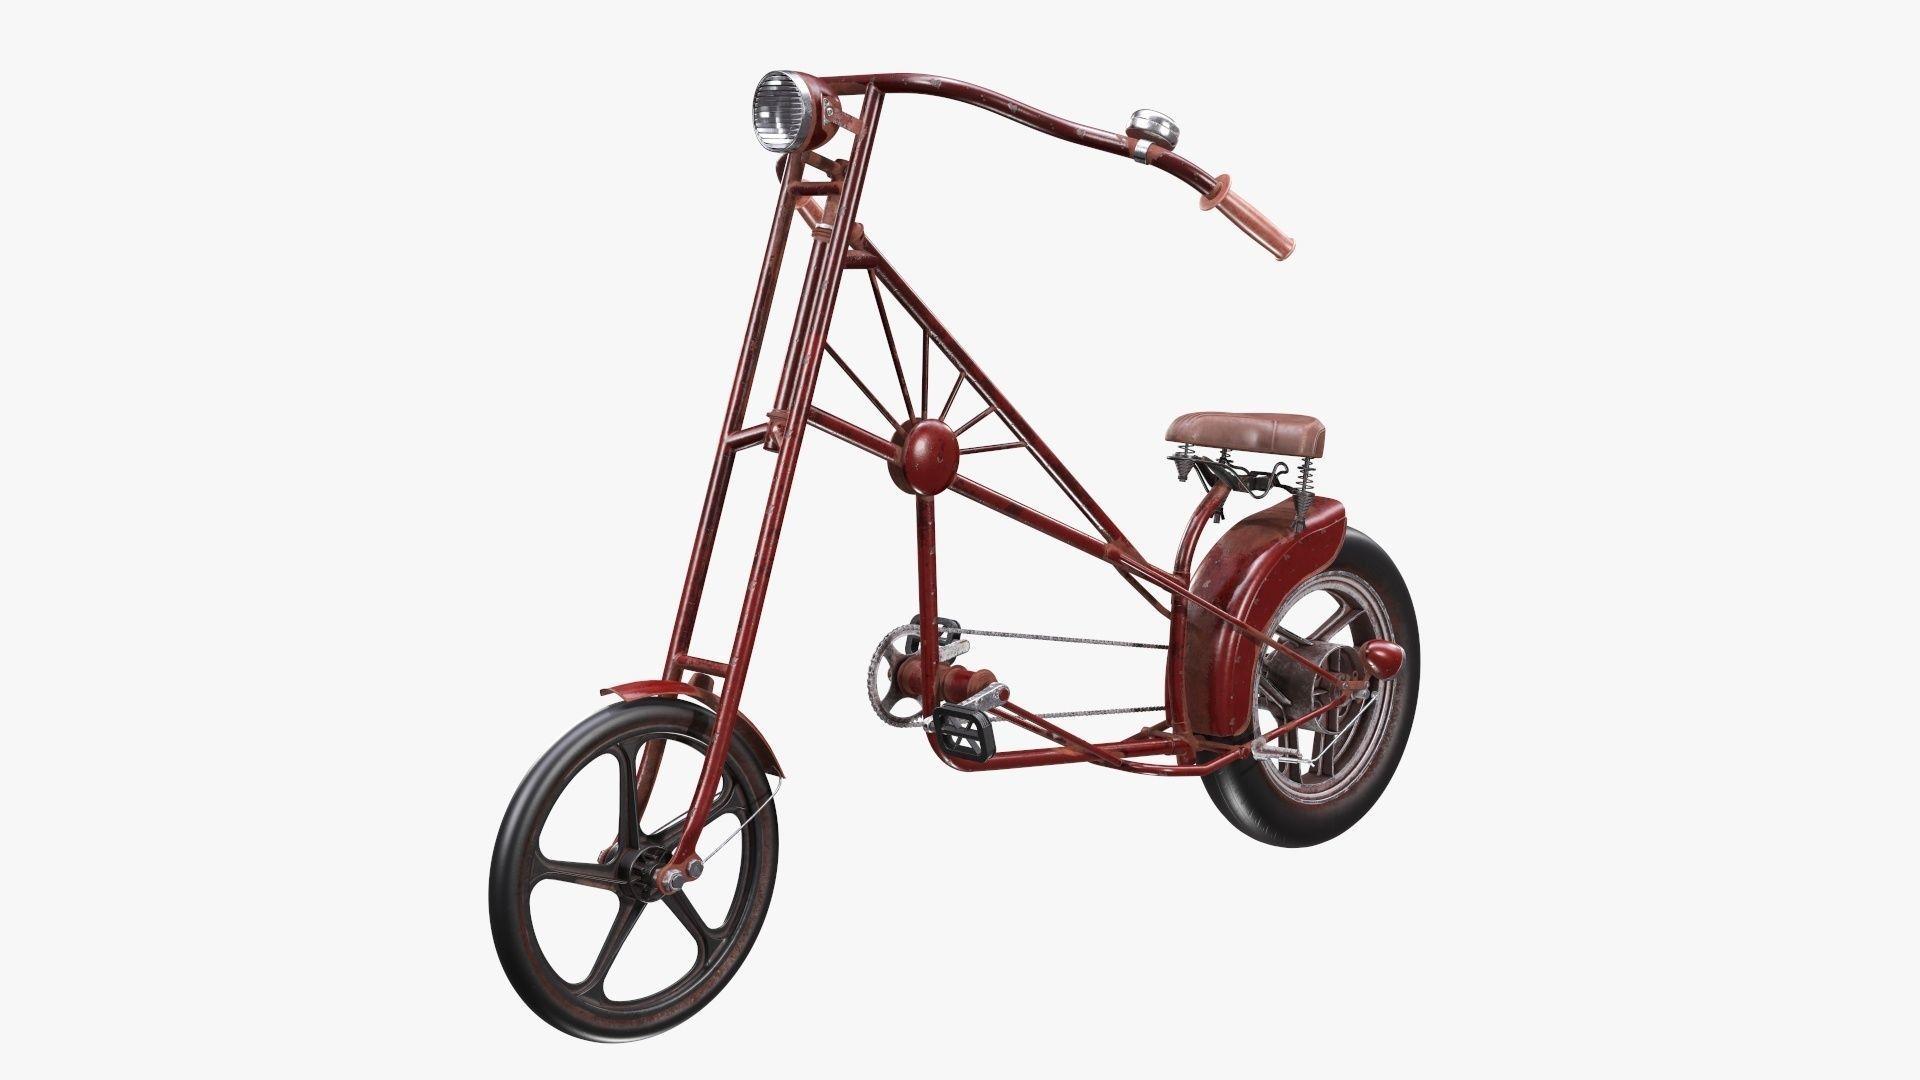 Vintage bicycle stylized